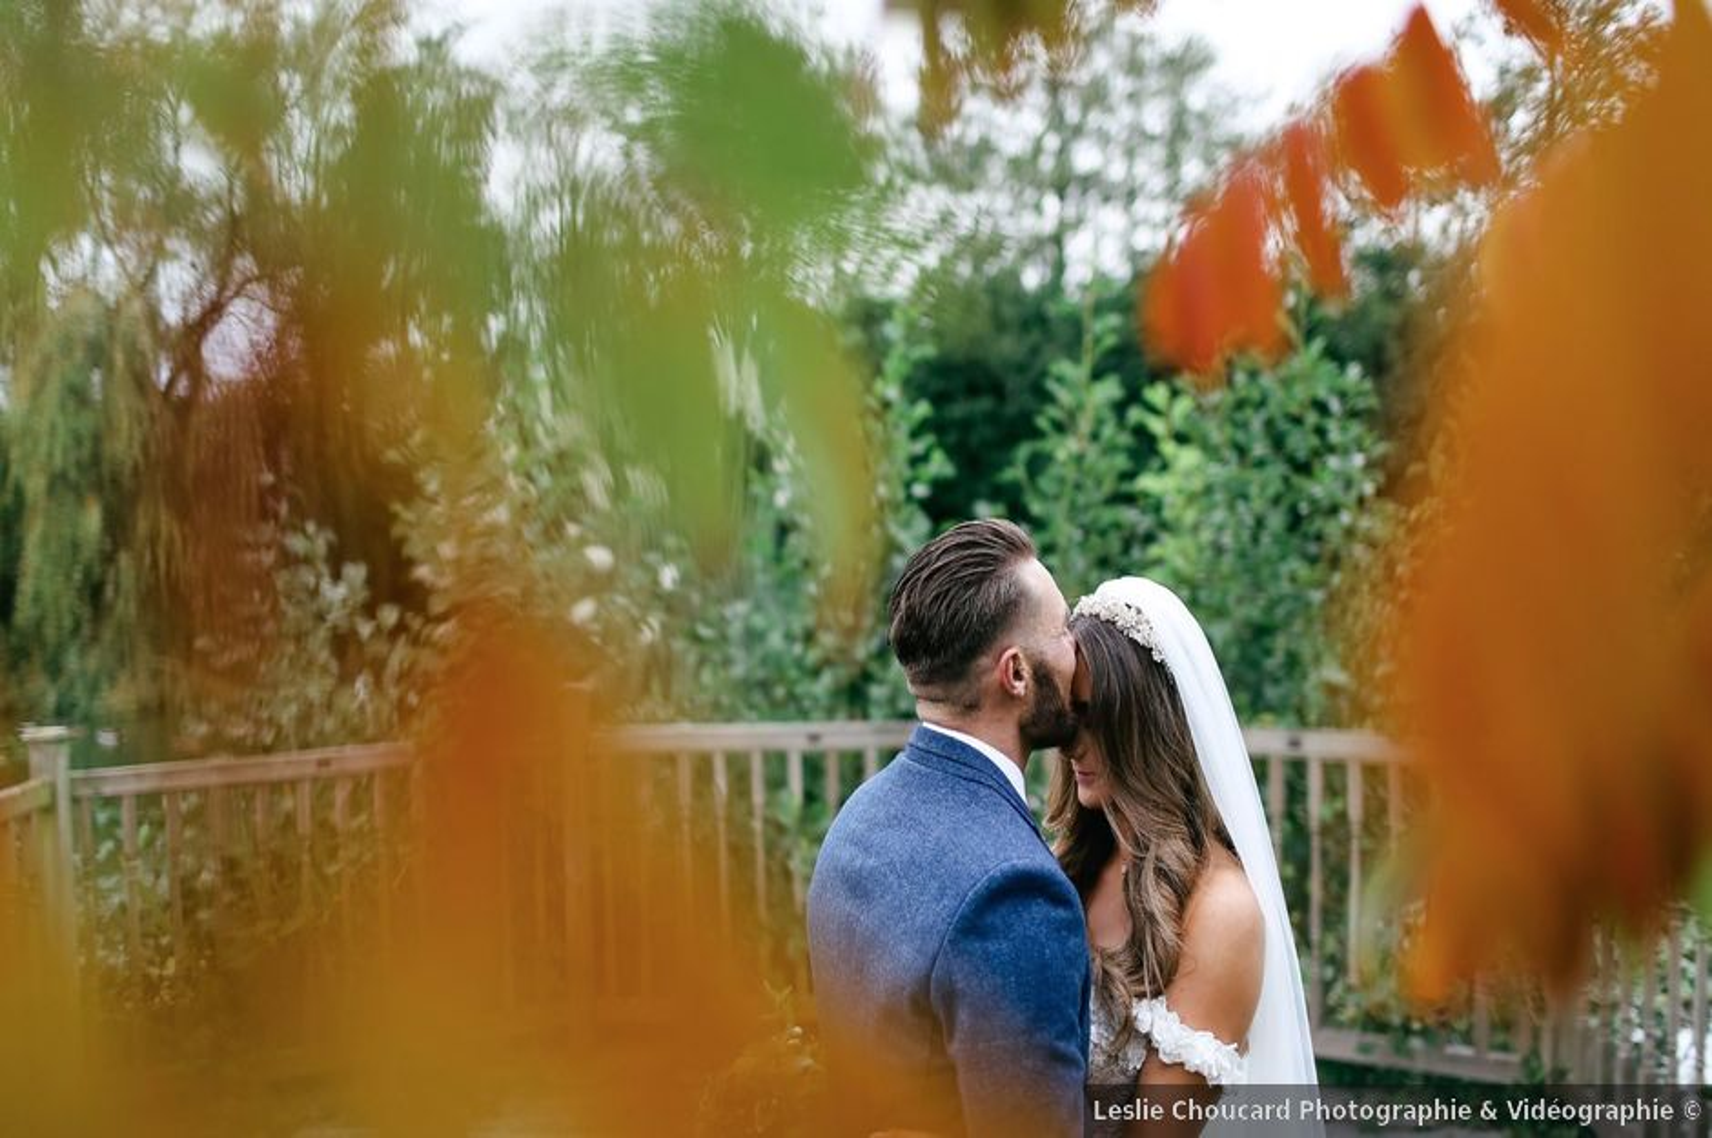 Le mariage de Stewart et Kara à Chessy, Seine-et-Marne